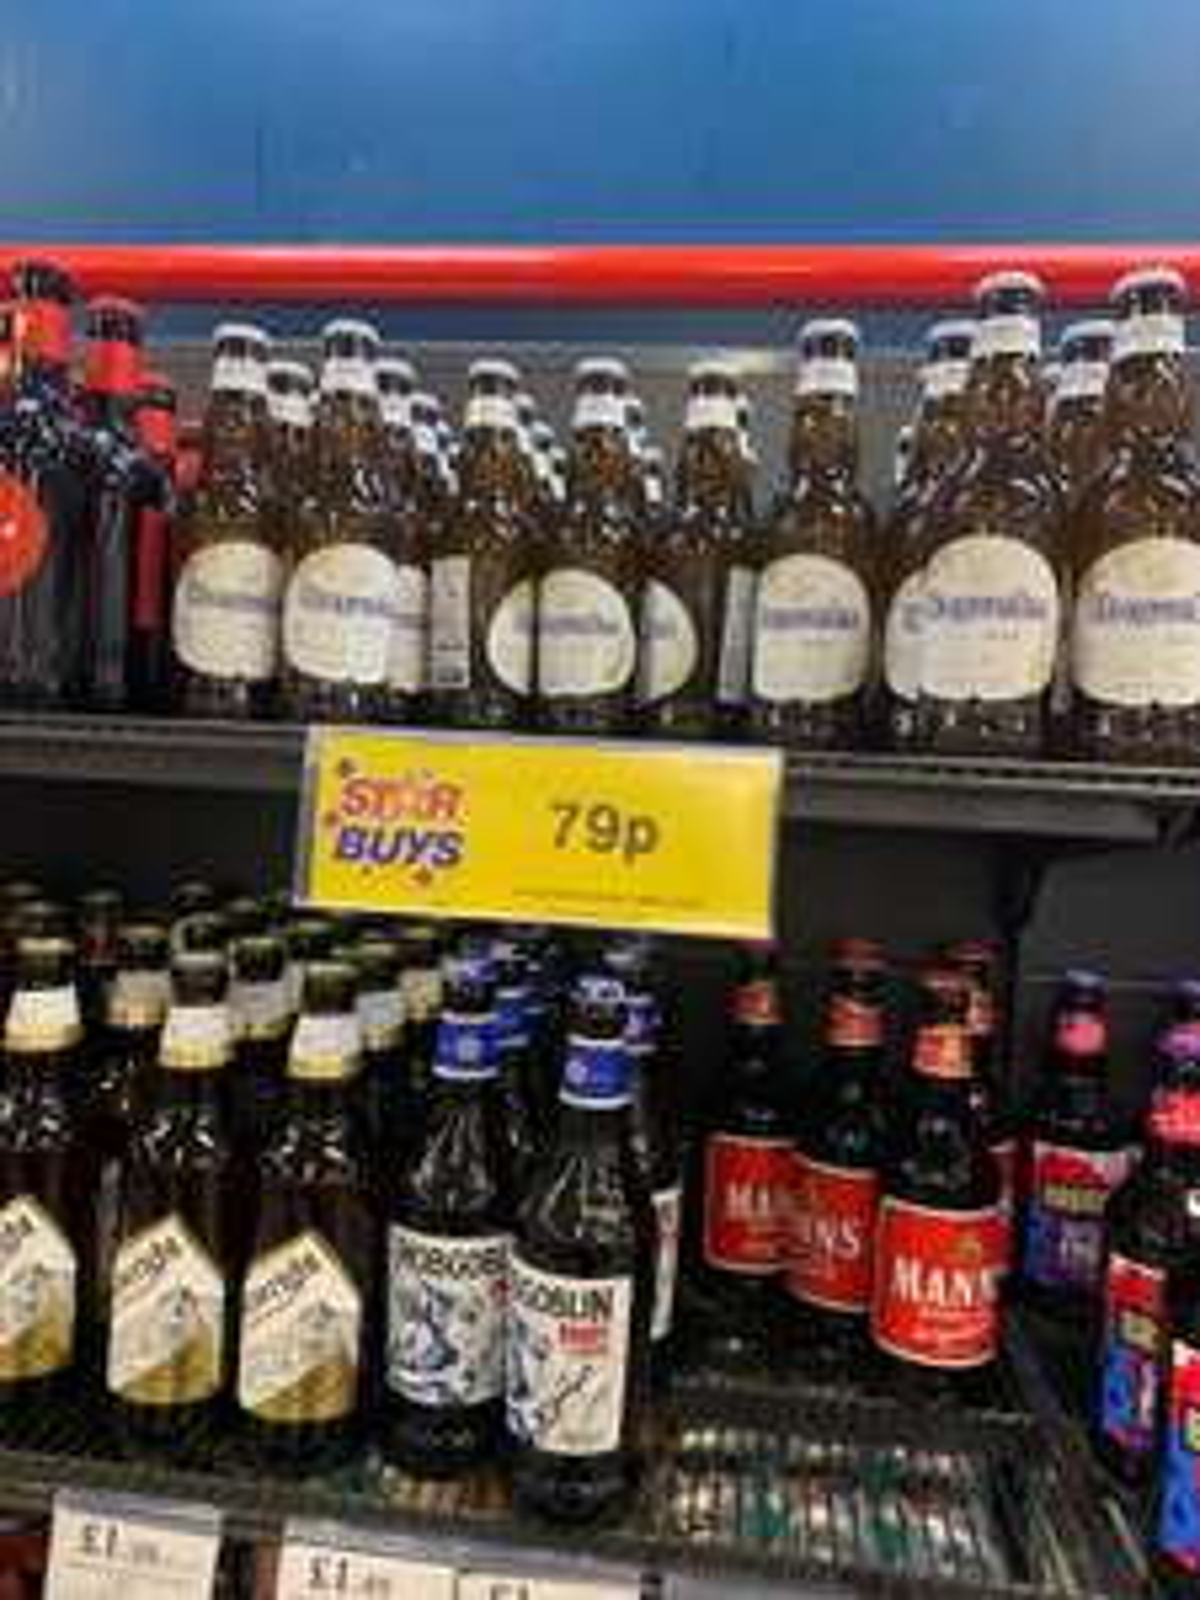 Hoegaarden Wheat Beer (330ml) - 79p Instore @ Home Bargains (Sheffield)